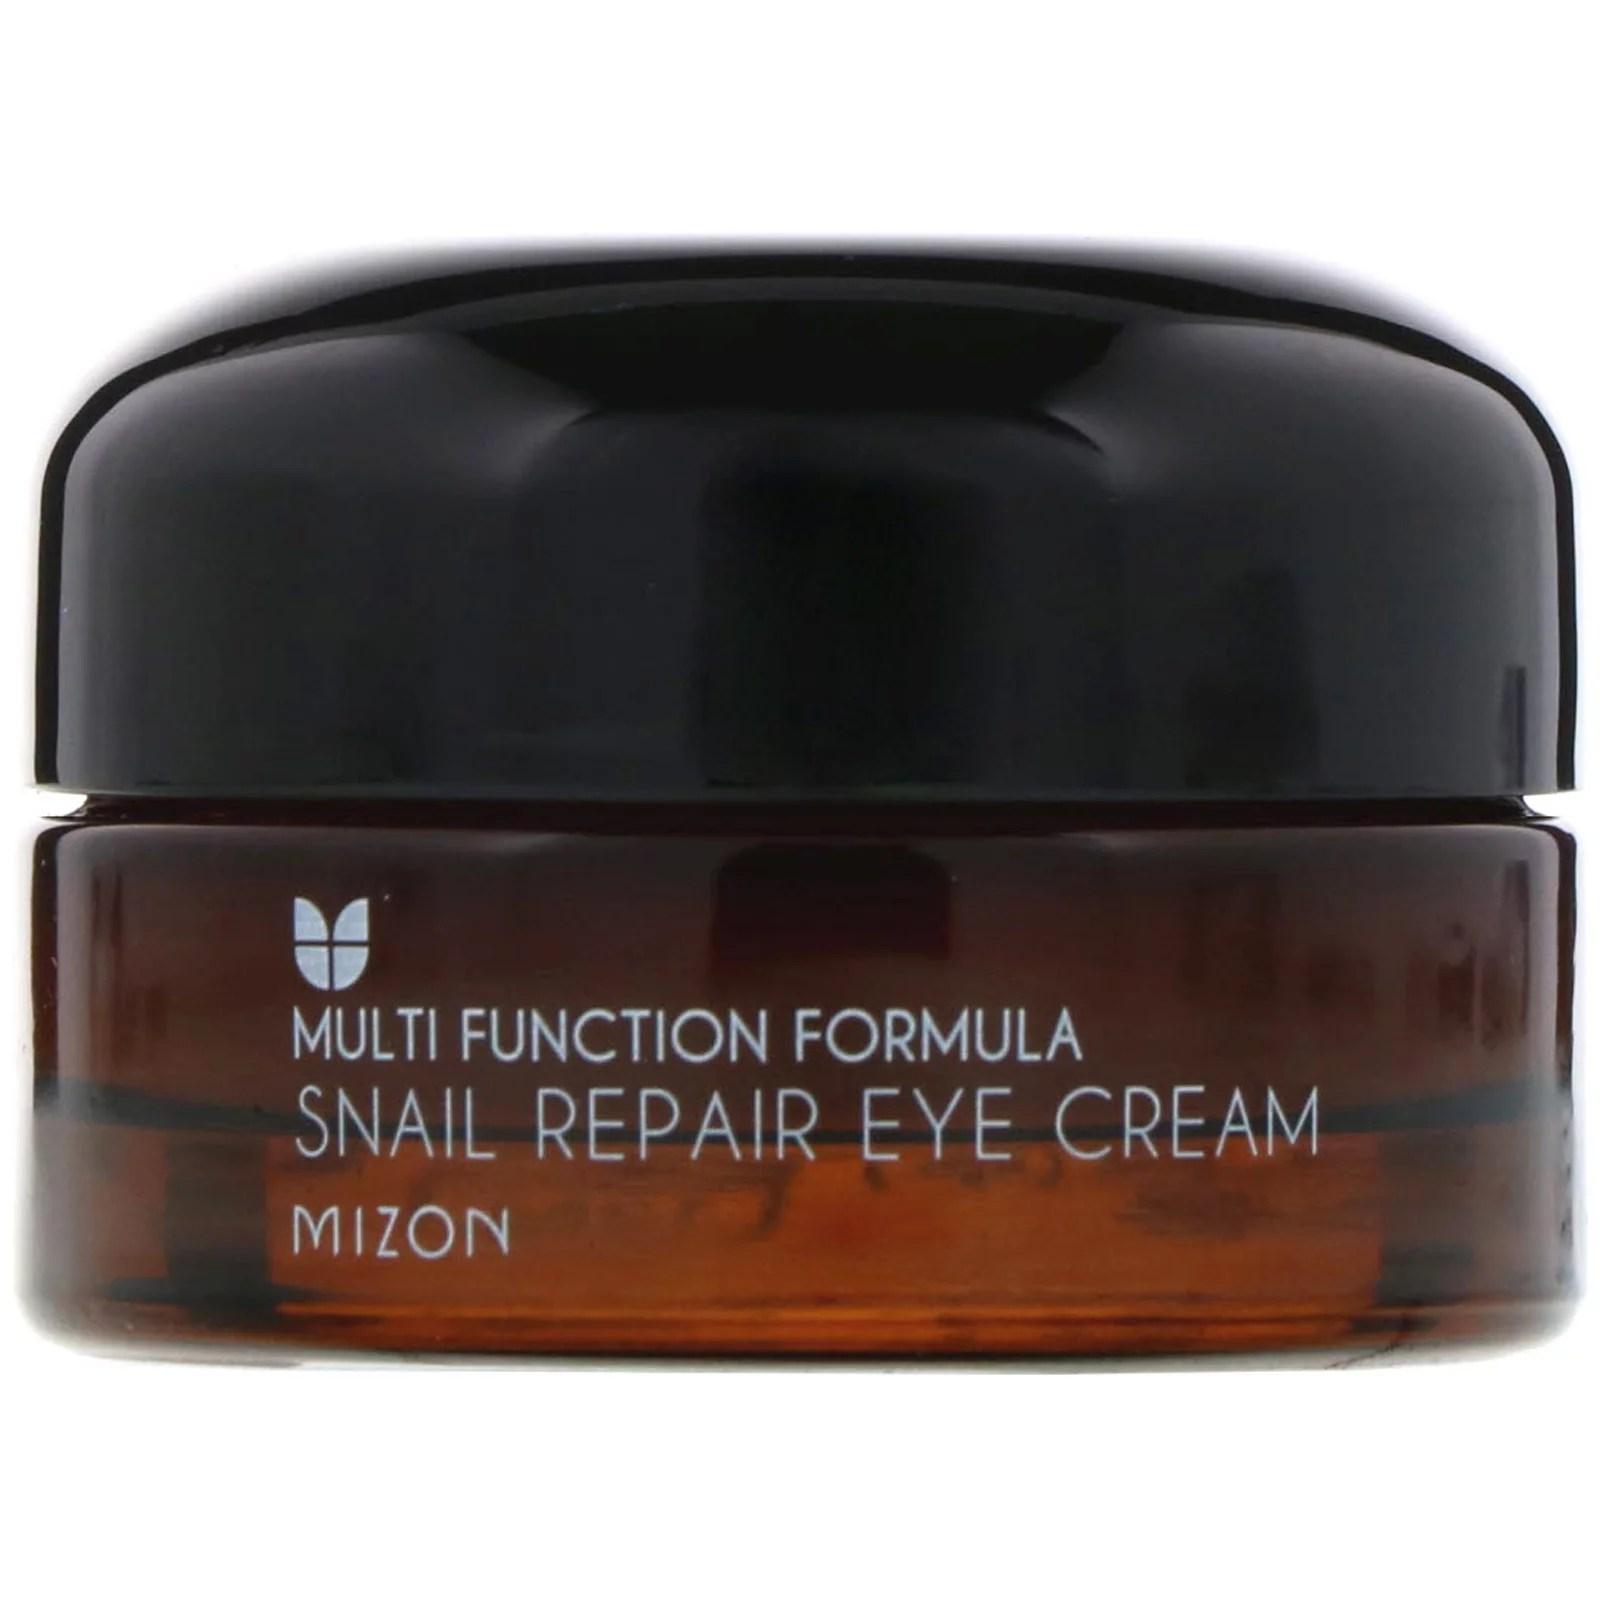 Mizon Snail Repair Eye Cream, 0.84 oz (25 ml)